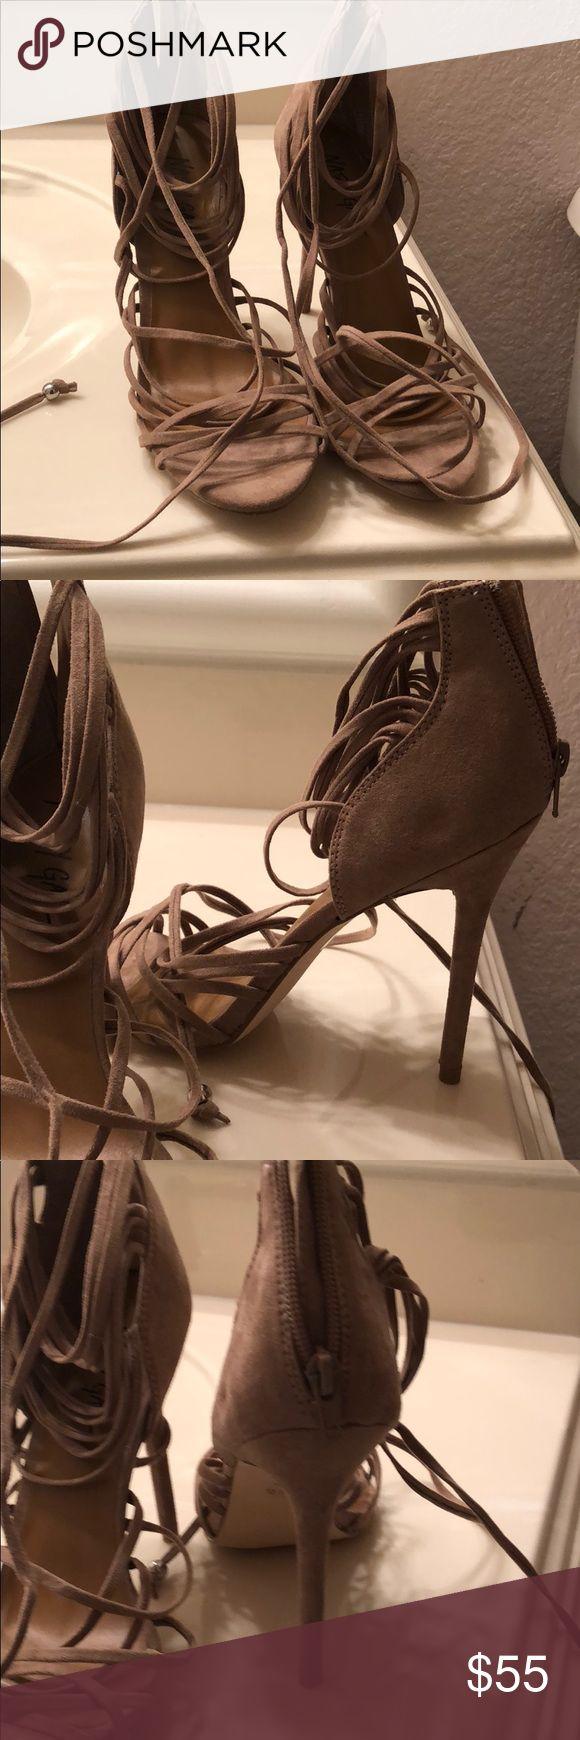 Nastygal heels Nude strappy heels that tie at the top Nasty Gal Shoes Heels